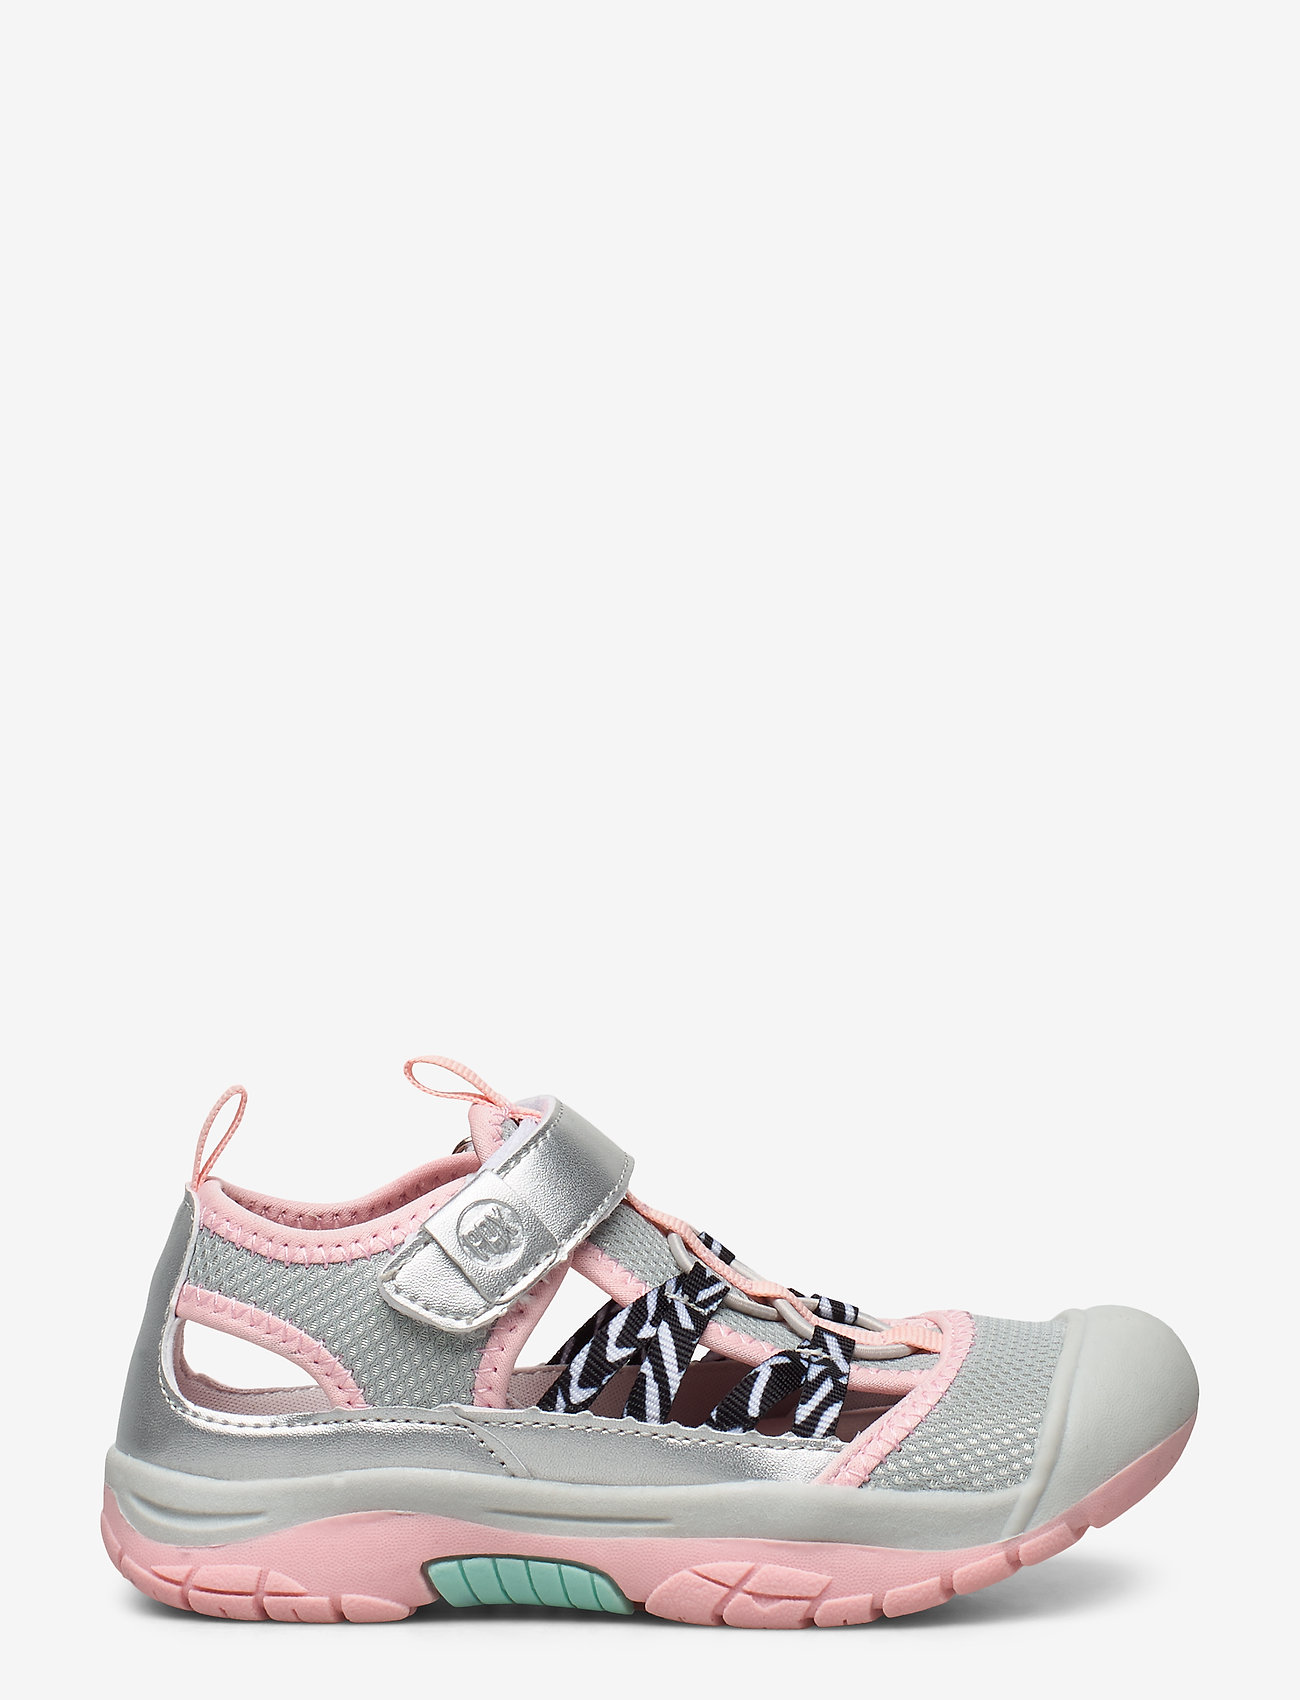 PAX - HOLK - sandals - silver